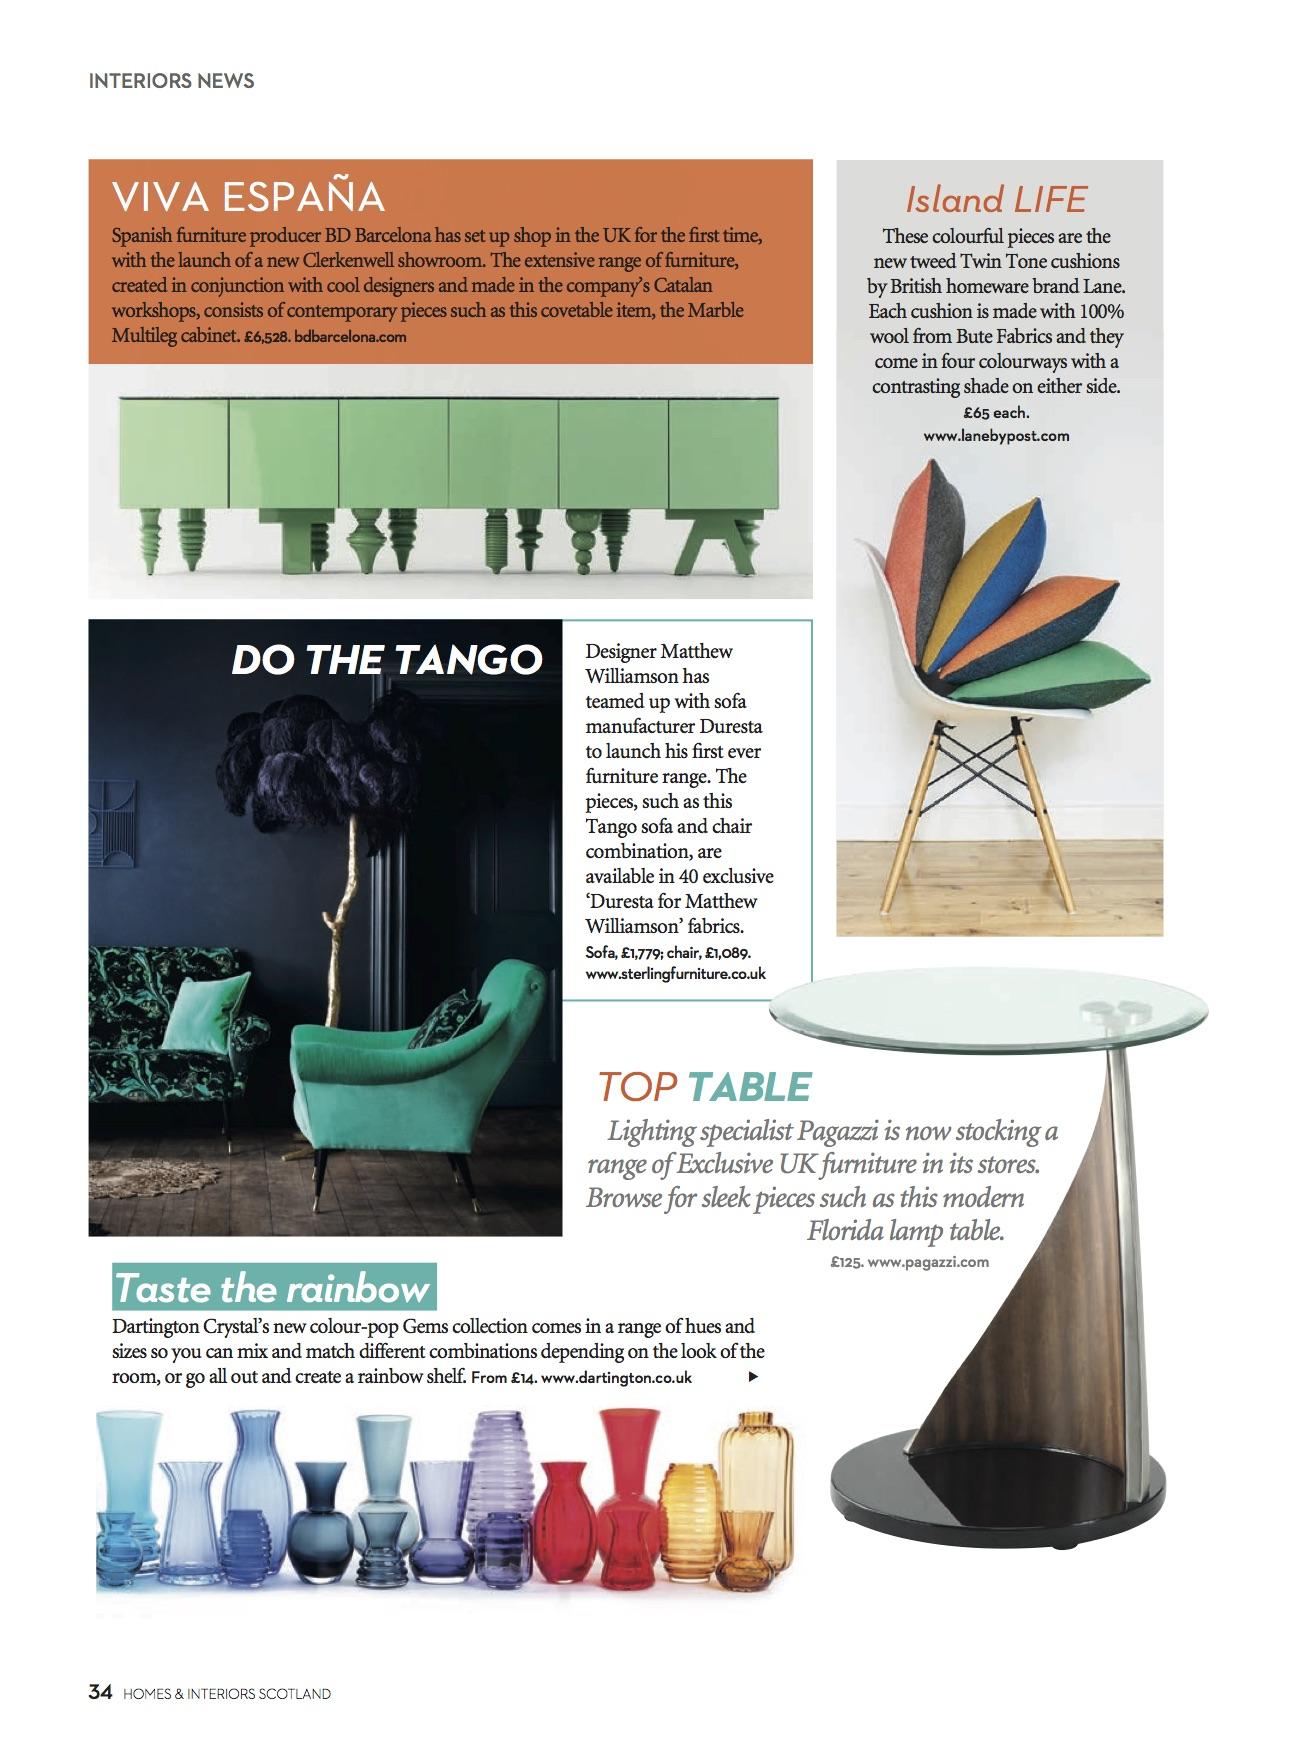 Homes & Interiors Scotland, October 2016, Lane & Little Greene Twin Tone Cushions